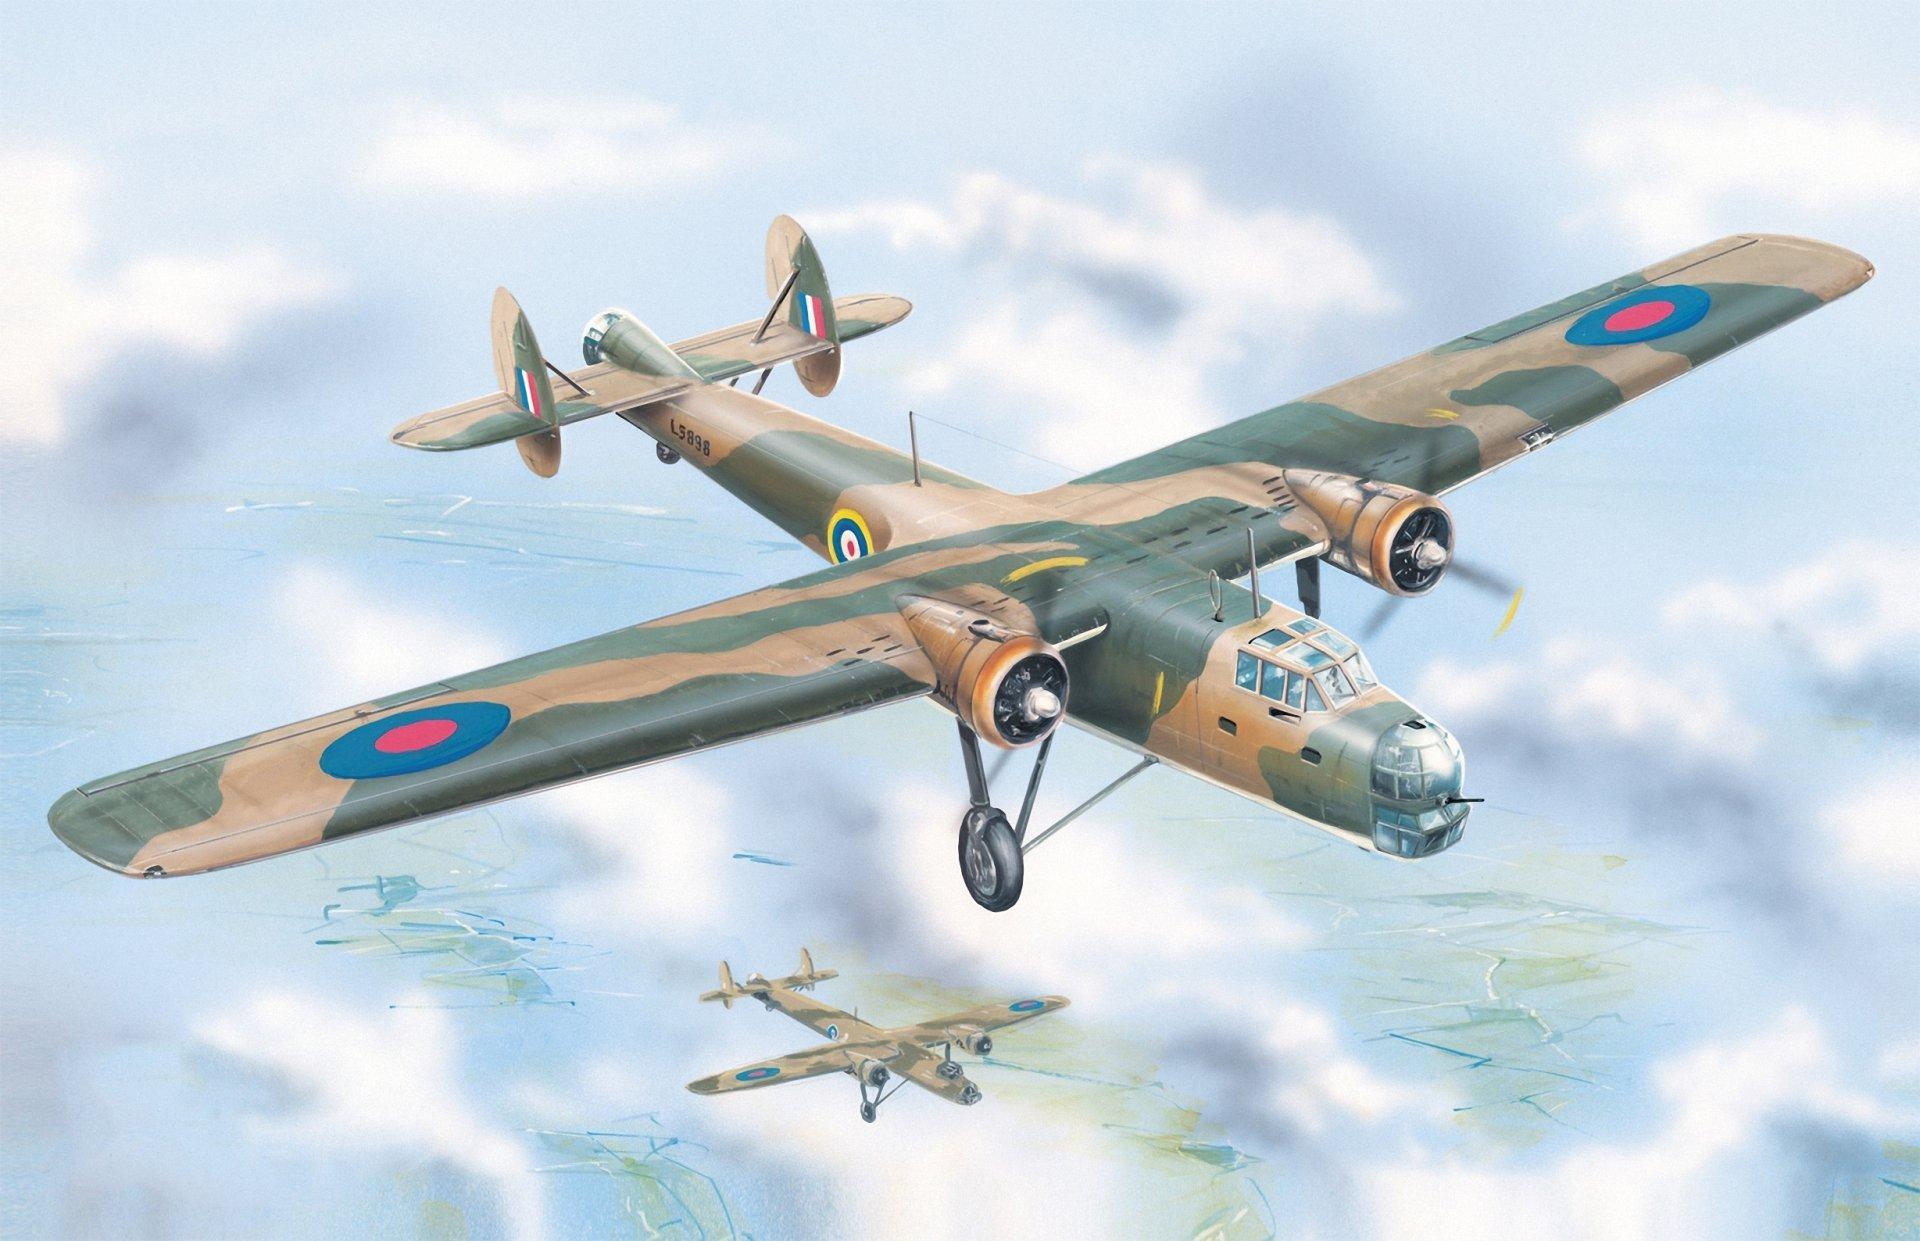 Drawn aircraft ww2 airplane British aircraft art painting airplane